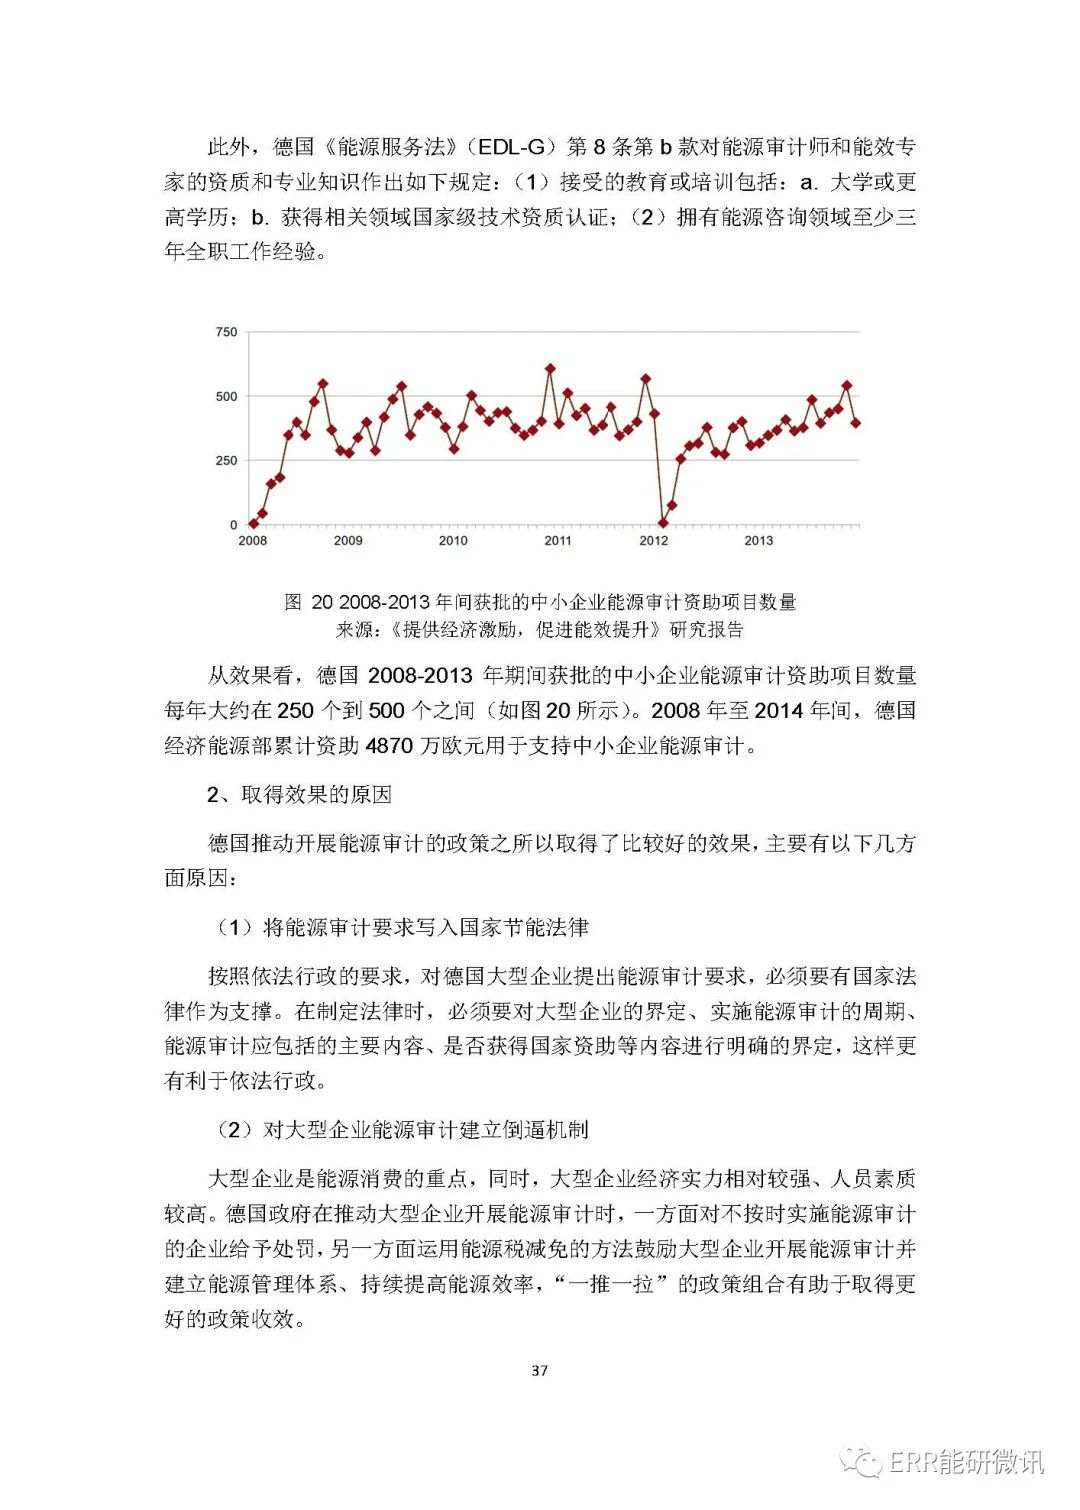 giz发布报告《德国节能政策研究》